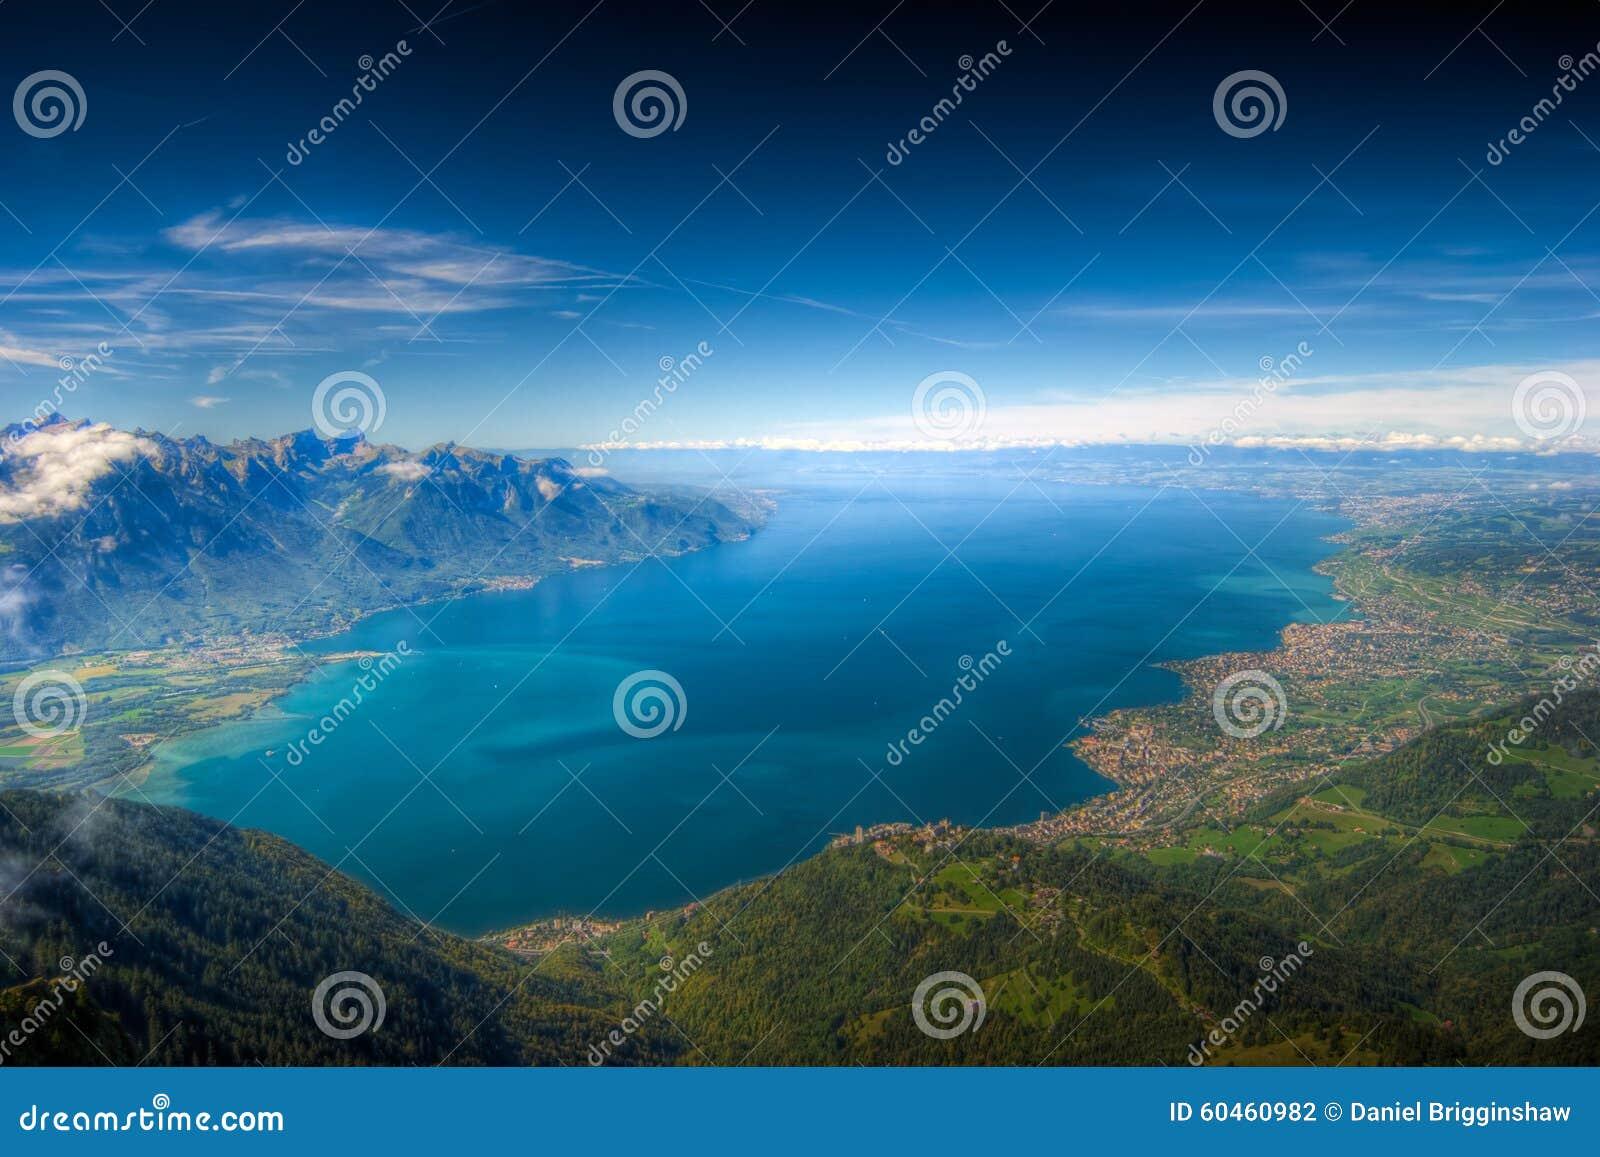 Lago Genebra, Switzerland, HDR